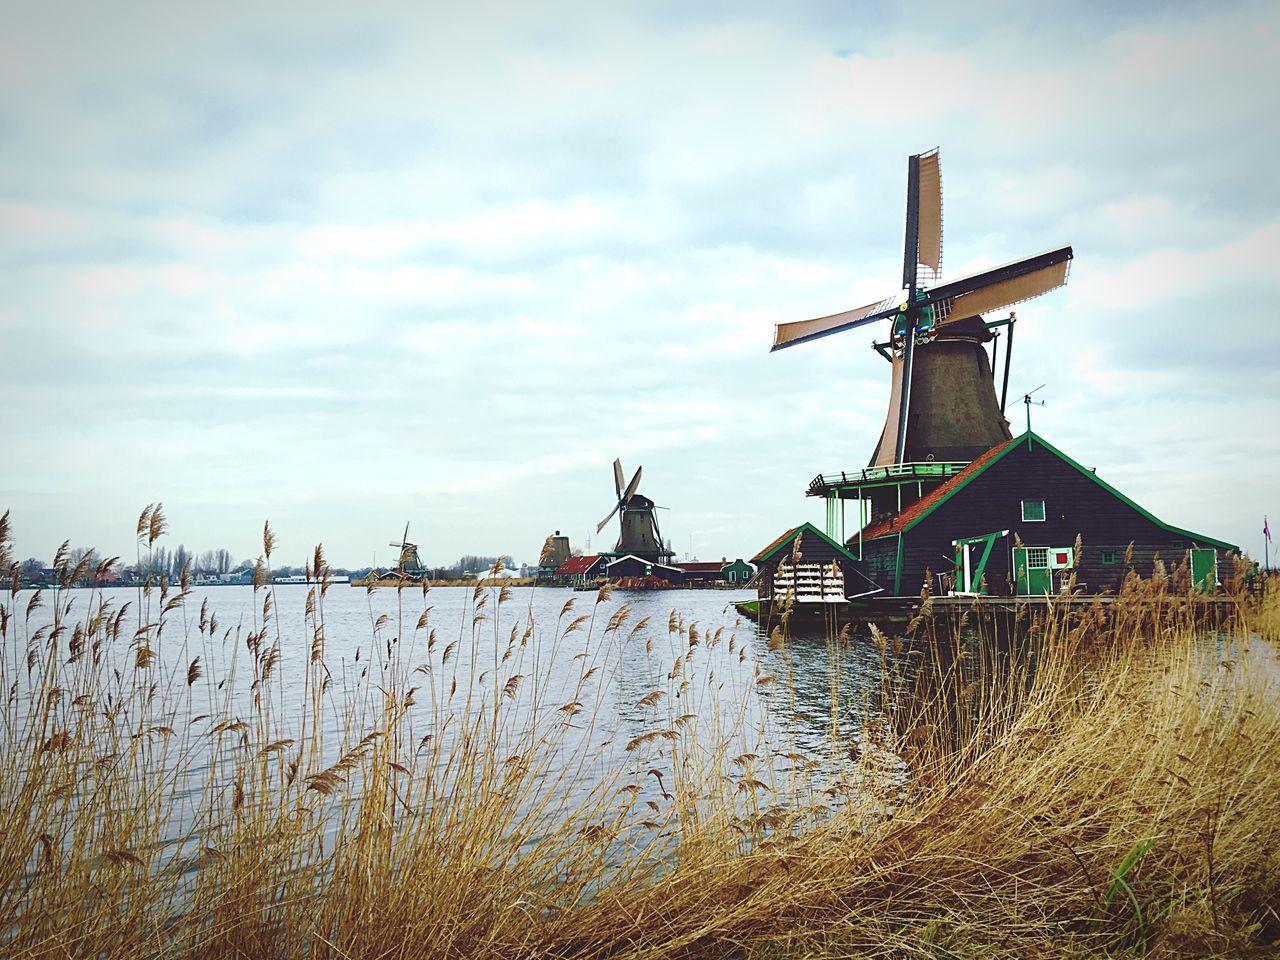 Windmills #photography Amsterdam Dutch EyeEm Best Edits Eyem Best Shots EyeEm Best Shots - Landscape Showcase: February Wintertime Lake View